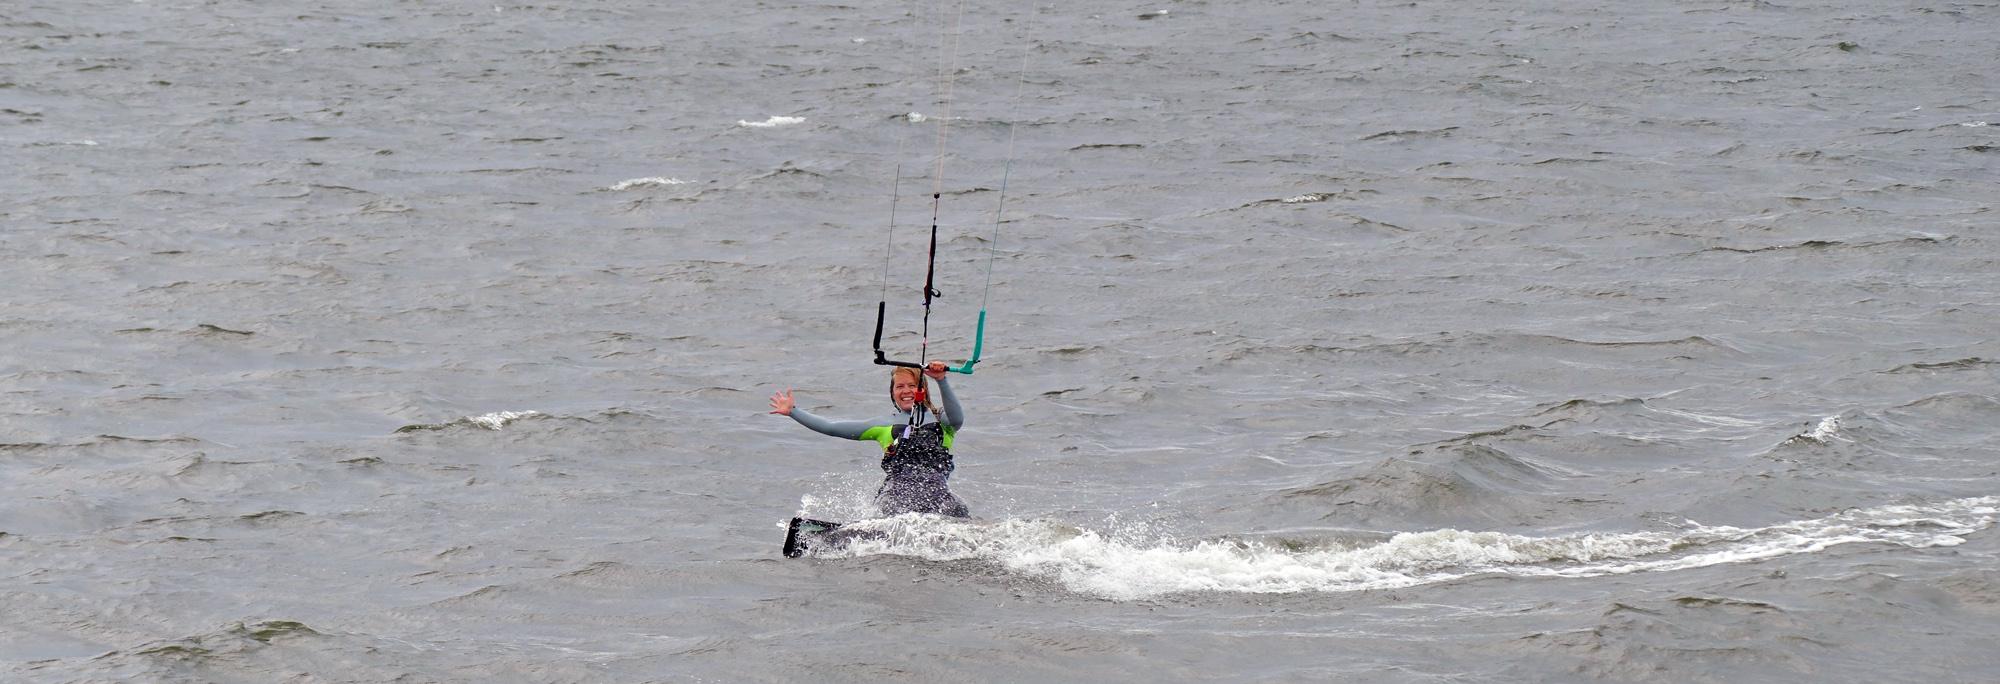 hopp kitesurfing g-kraft